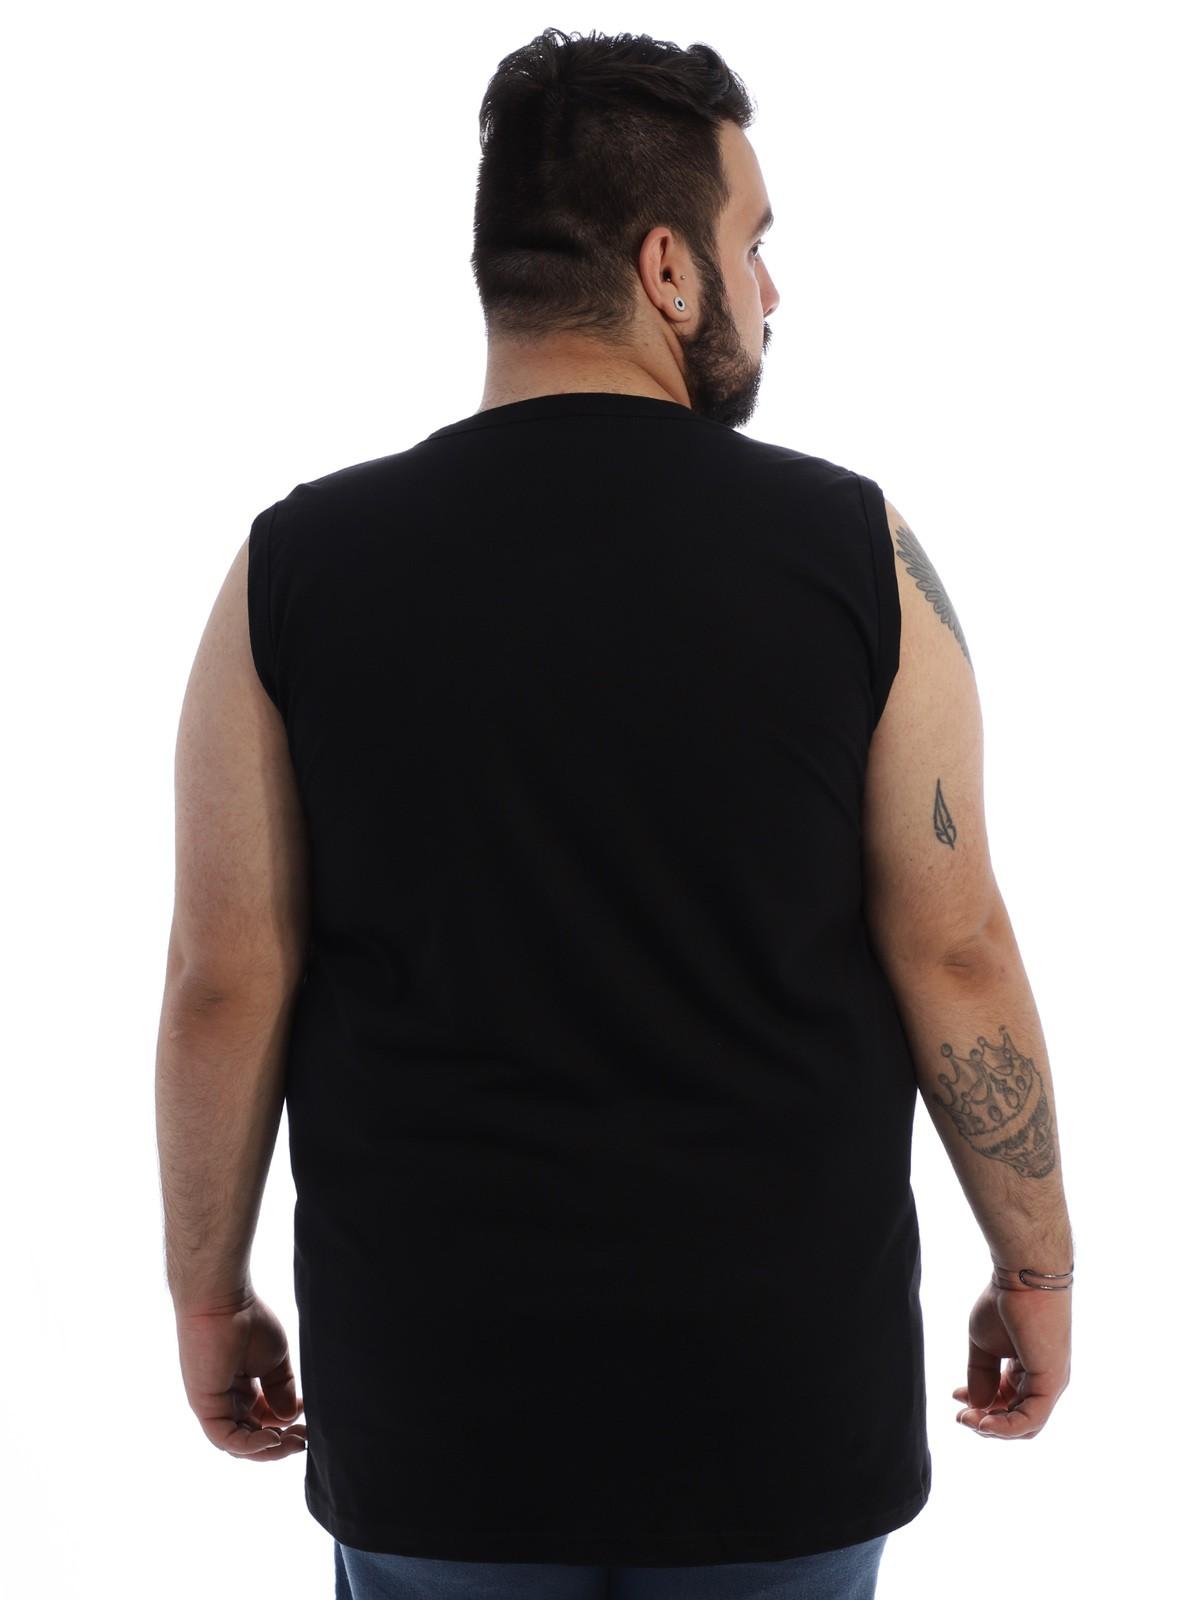 Regata Plus Size Masculina Algodão Estampada Lata Preta